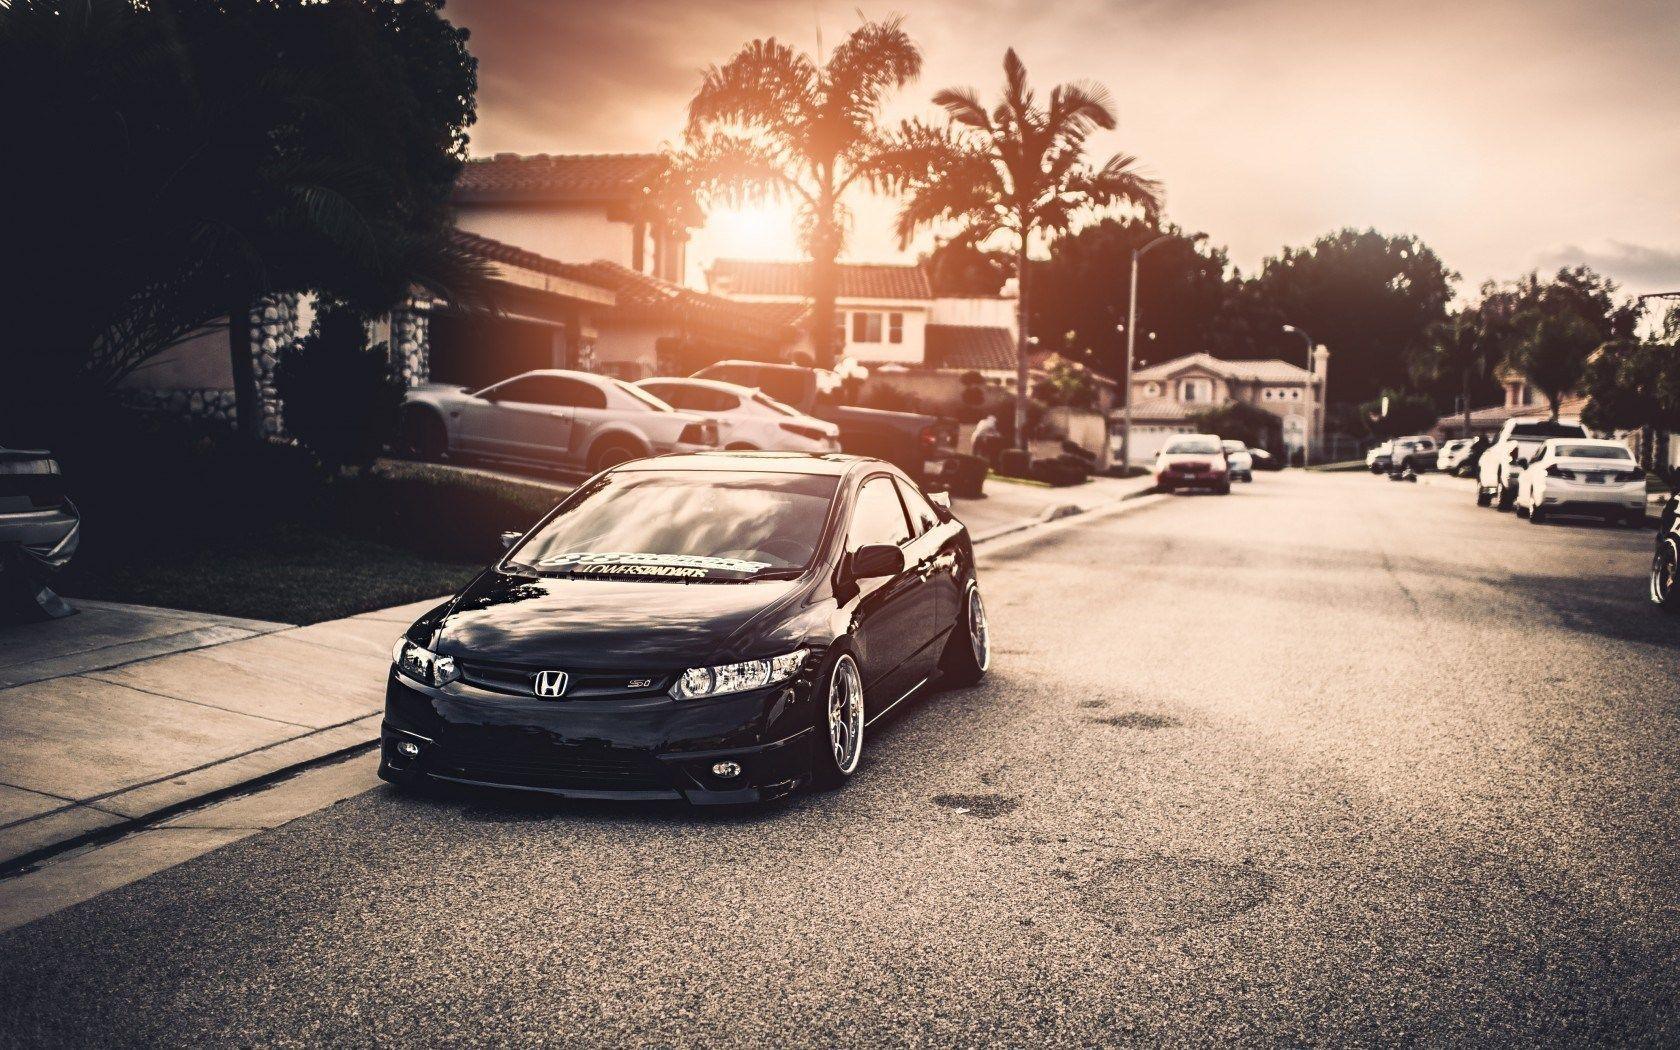 Honda Civic Wallpapers - Wallpaper Cave